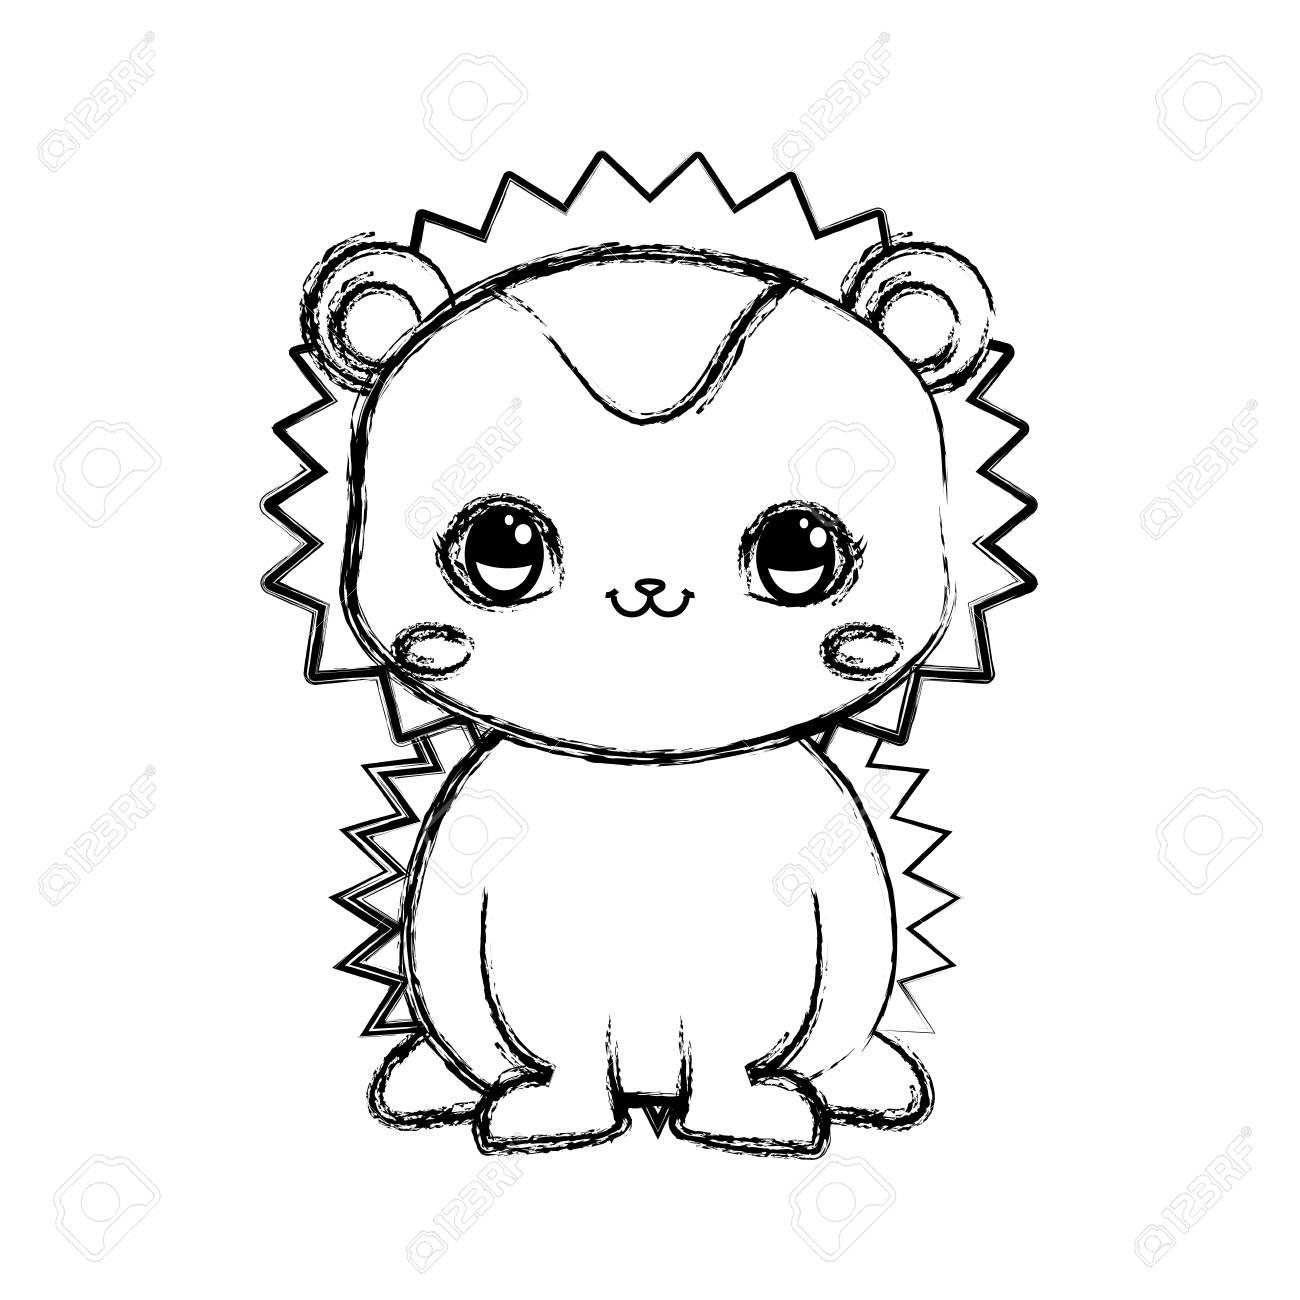 Cute Hedgehog Baby Sitting Cartoon Vector Illustration Hand Drawing